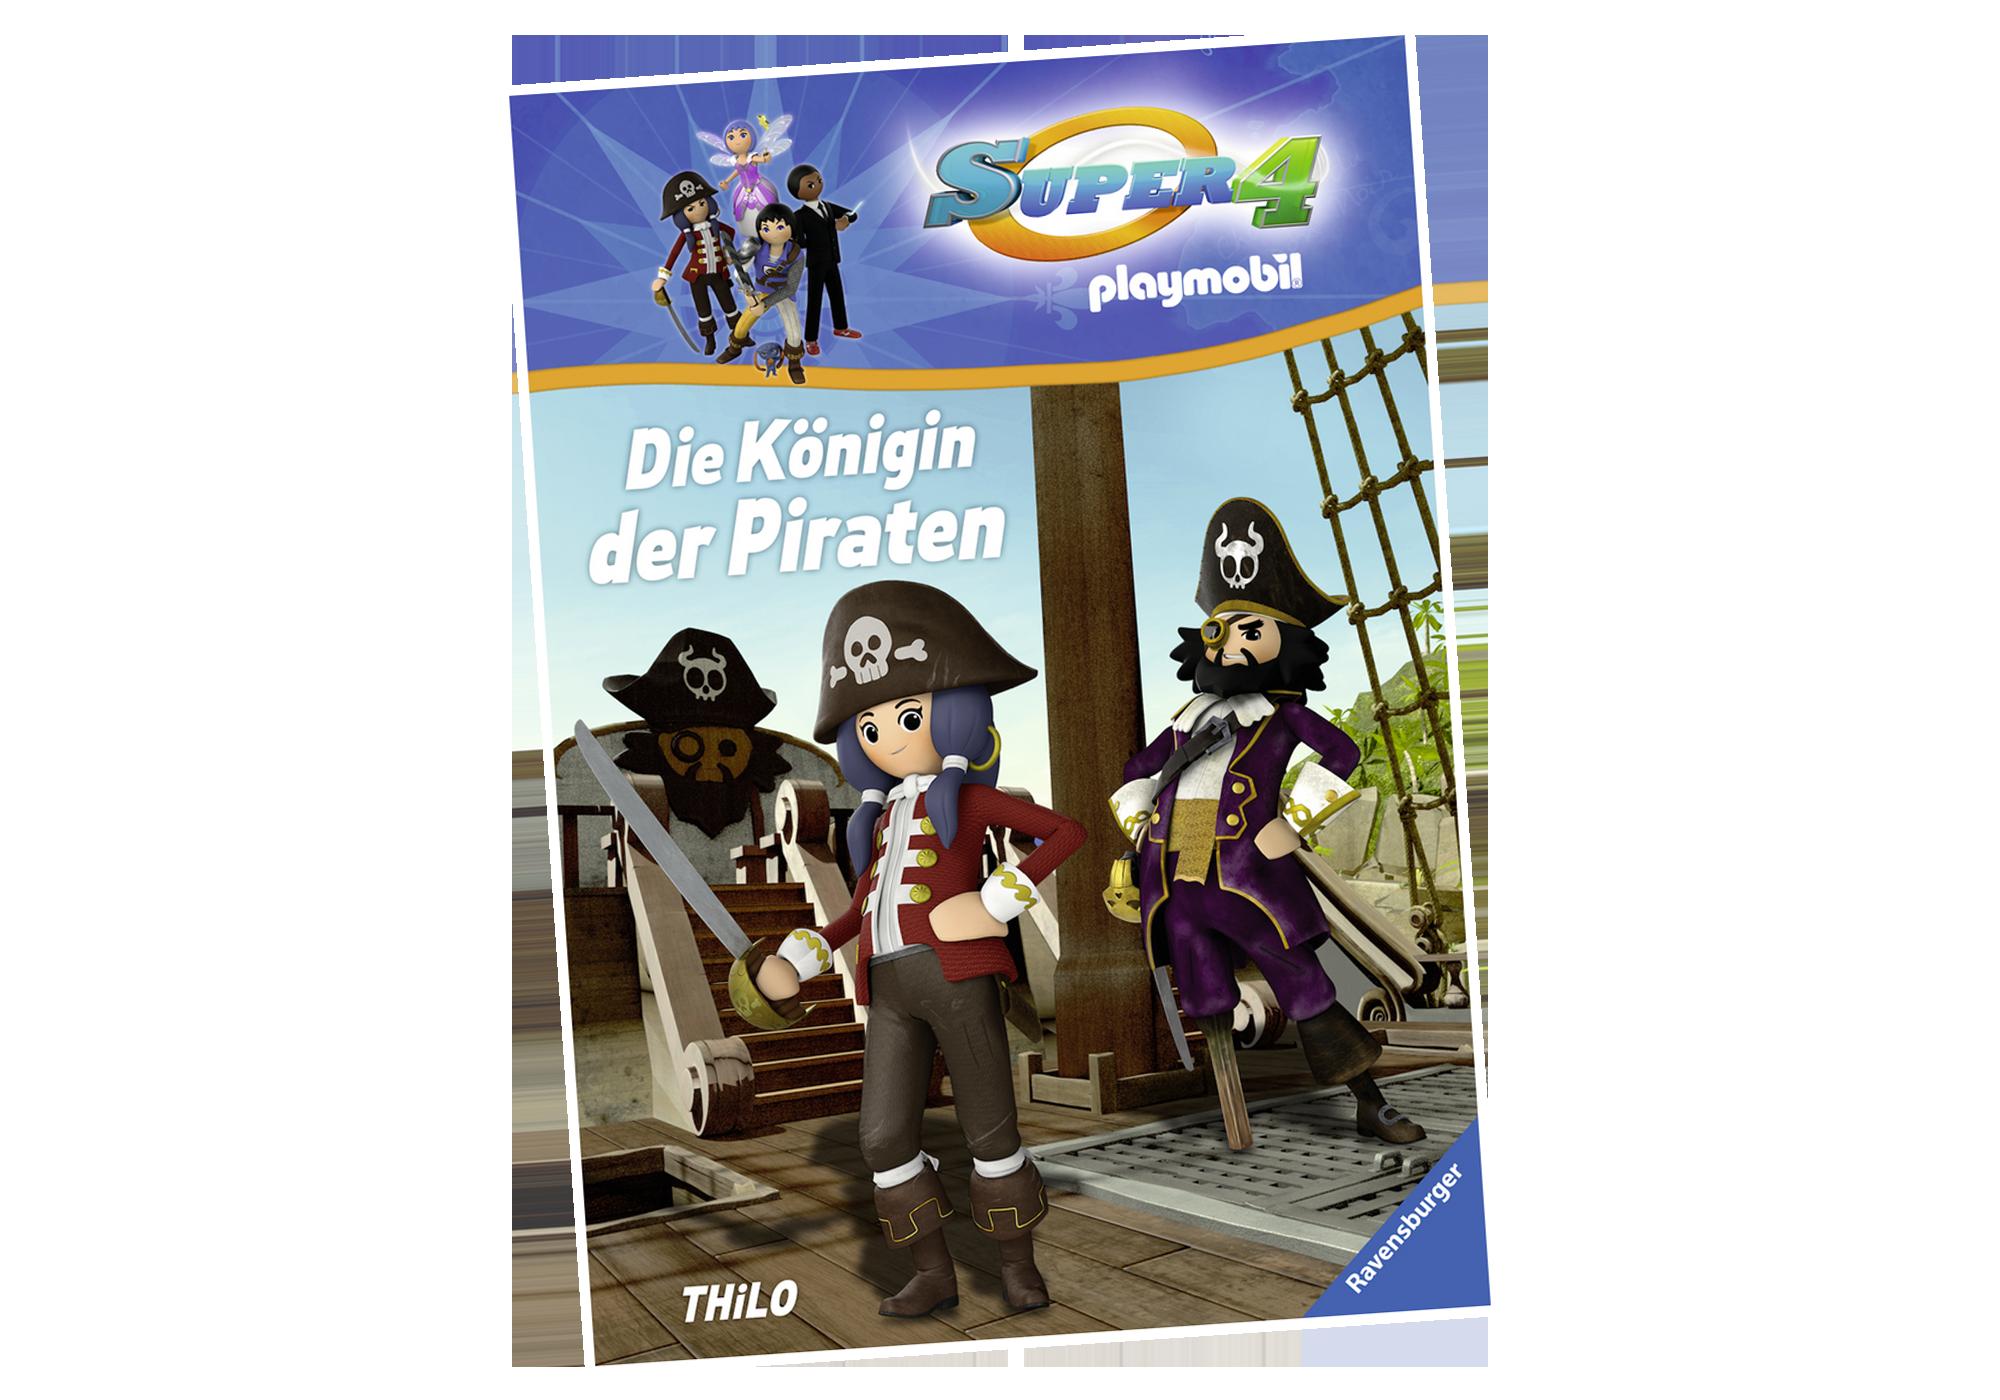 http://media.playmobil.com/i/playmobil/80485_product_detail/Super 4: Erstleser - Die Königin der Piraten